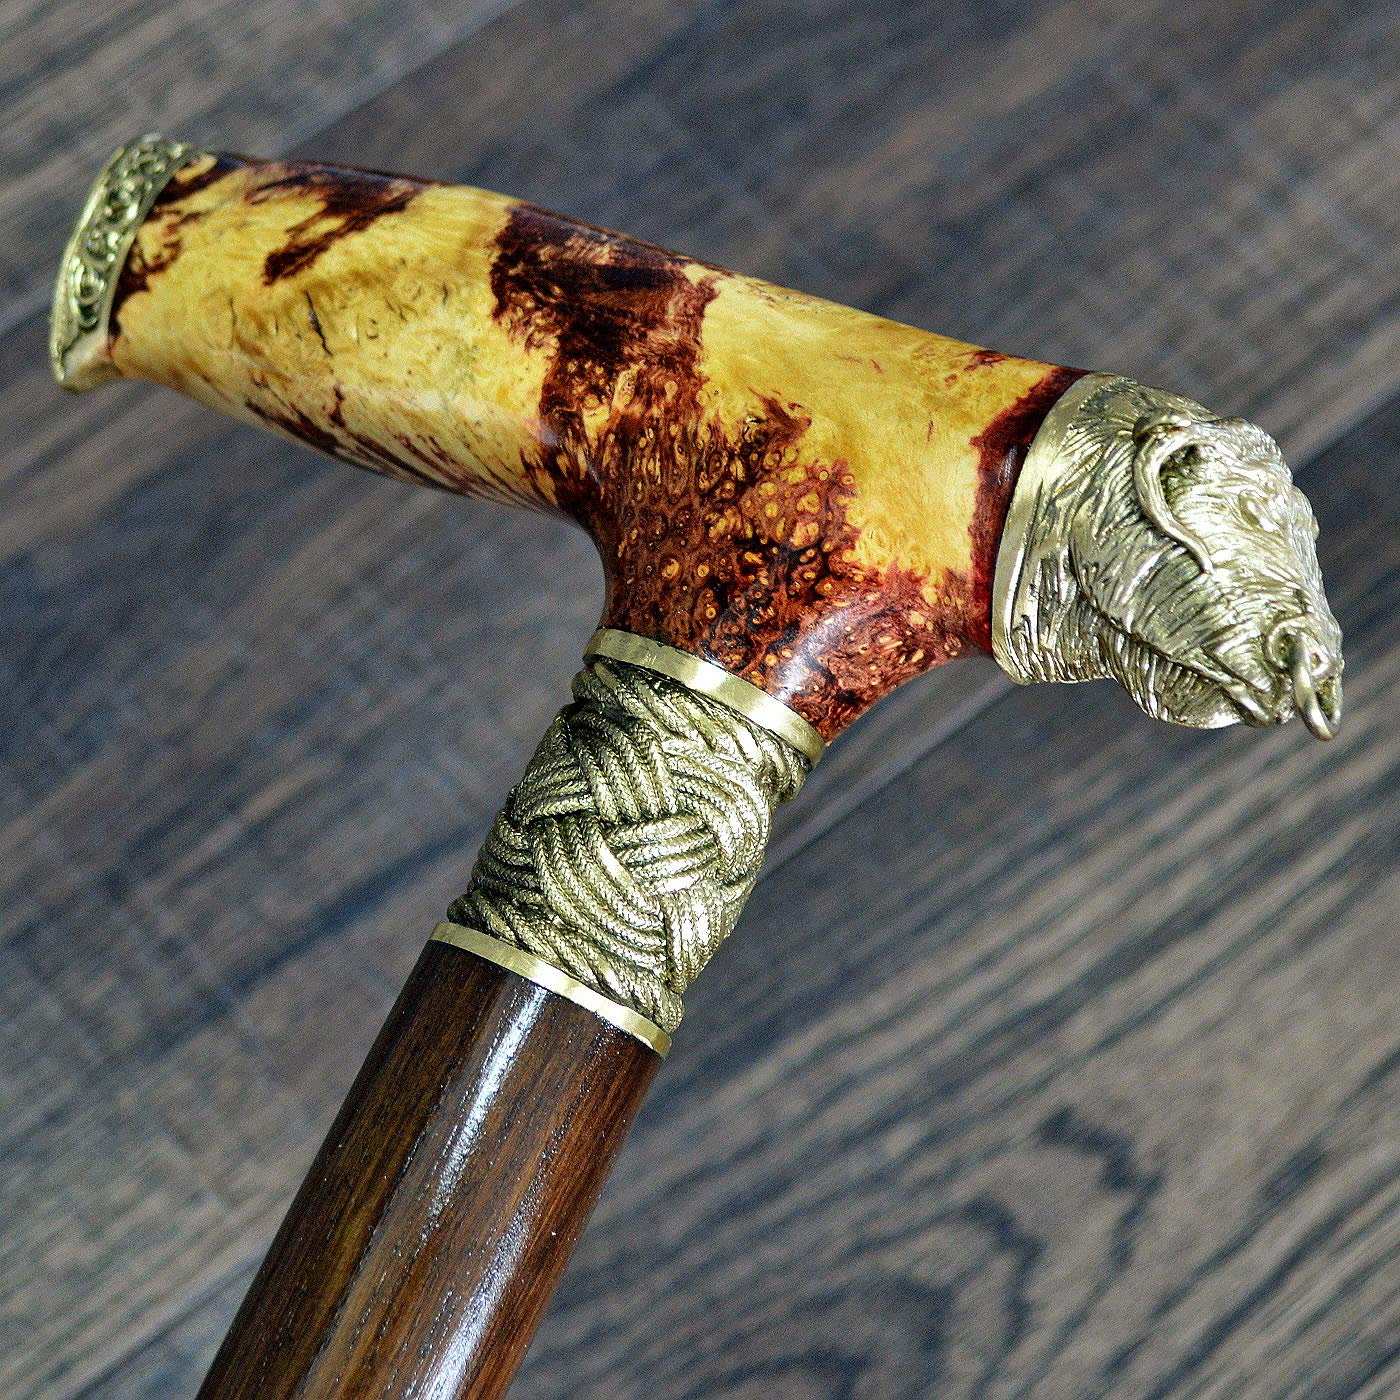 oleksandr.victory Canes Walking Sticks Wood Reeds Bronze Wooden stabilized BURL Handmade Cane Stick Men's Accessories Bull